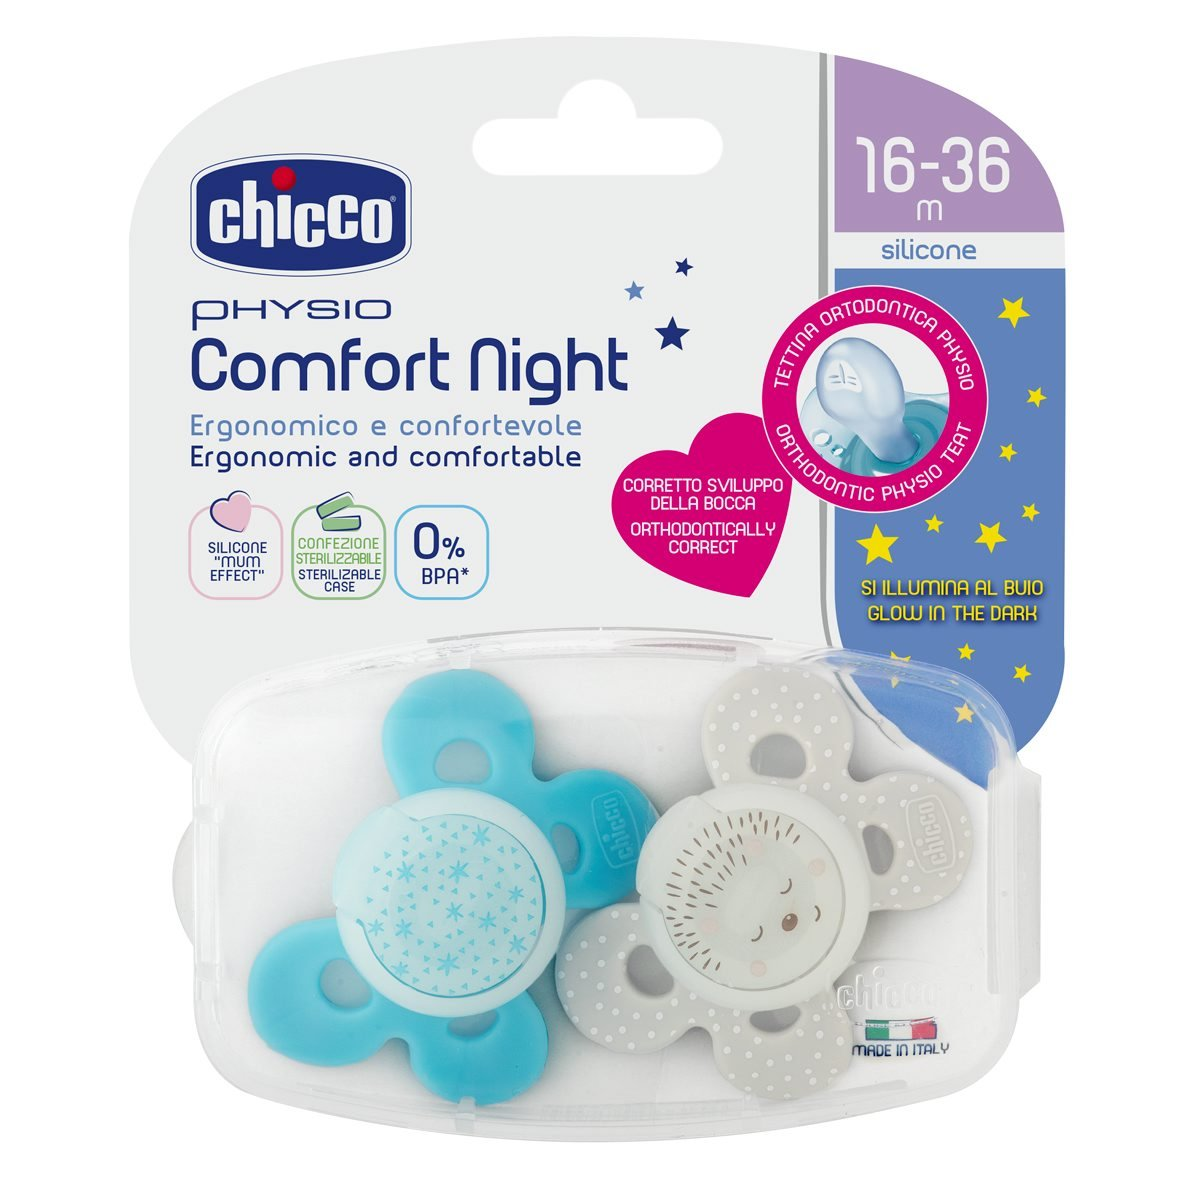 Chicco Physio Comfort - Pack de 2 chupetes de silicona 16-36 m, color azul (diseños surtidos)